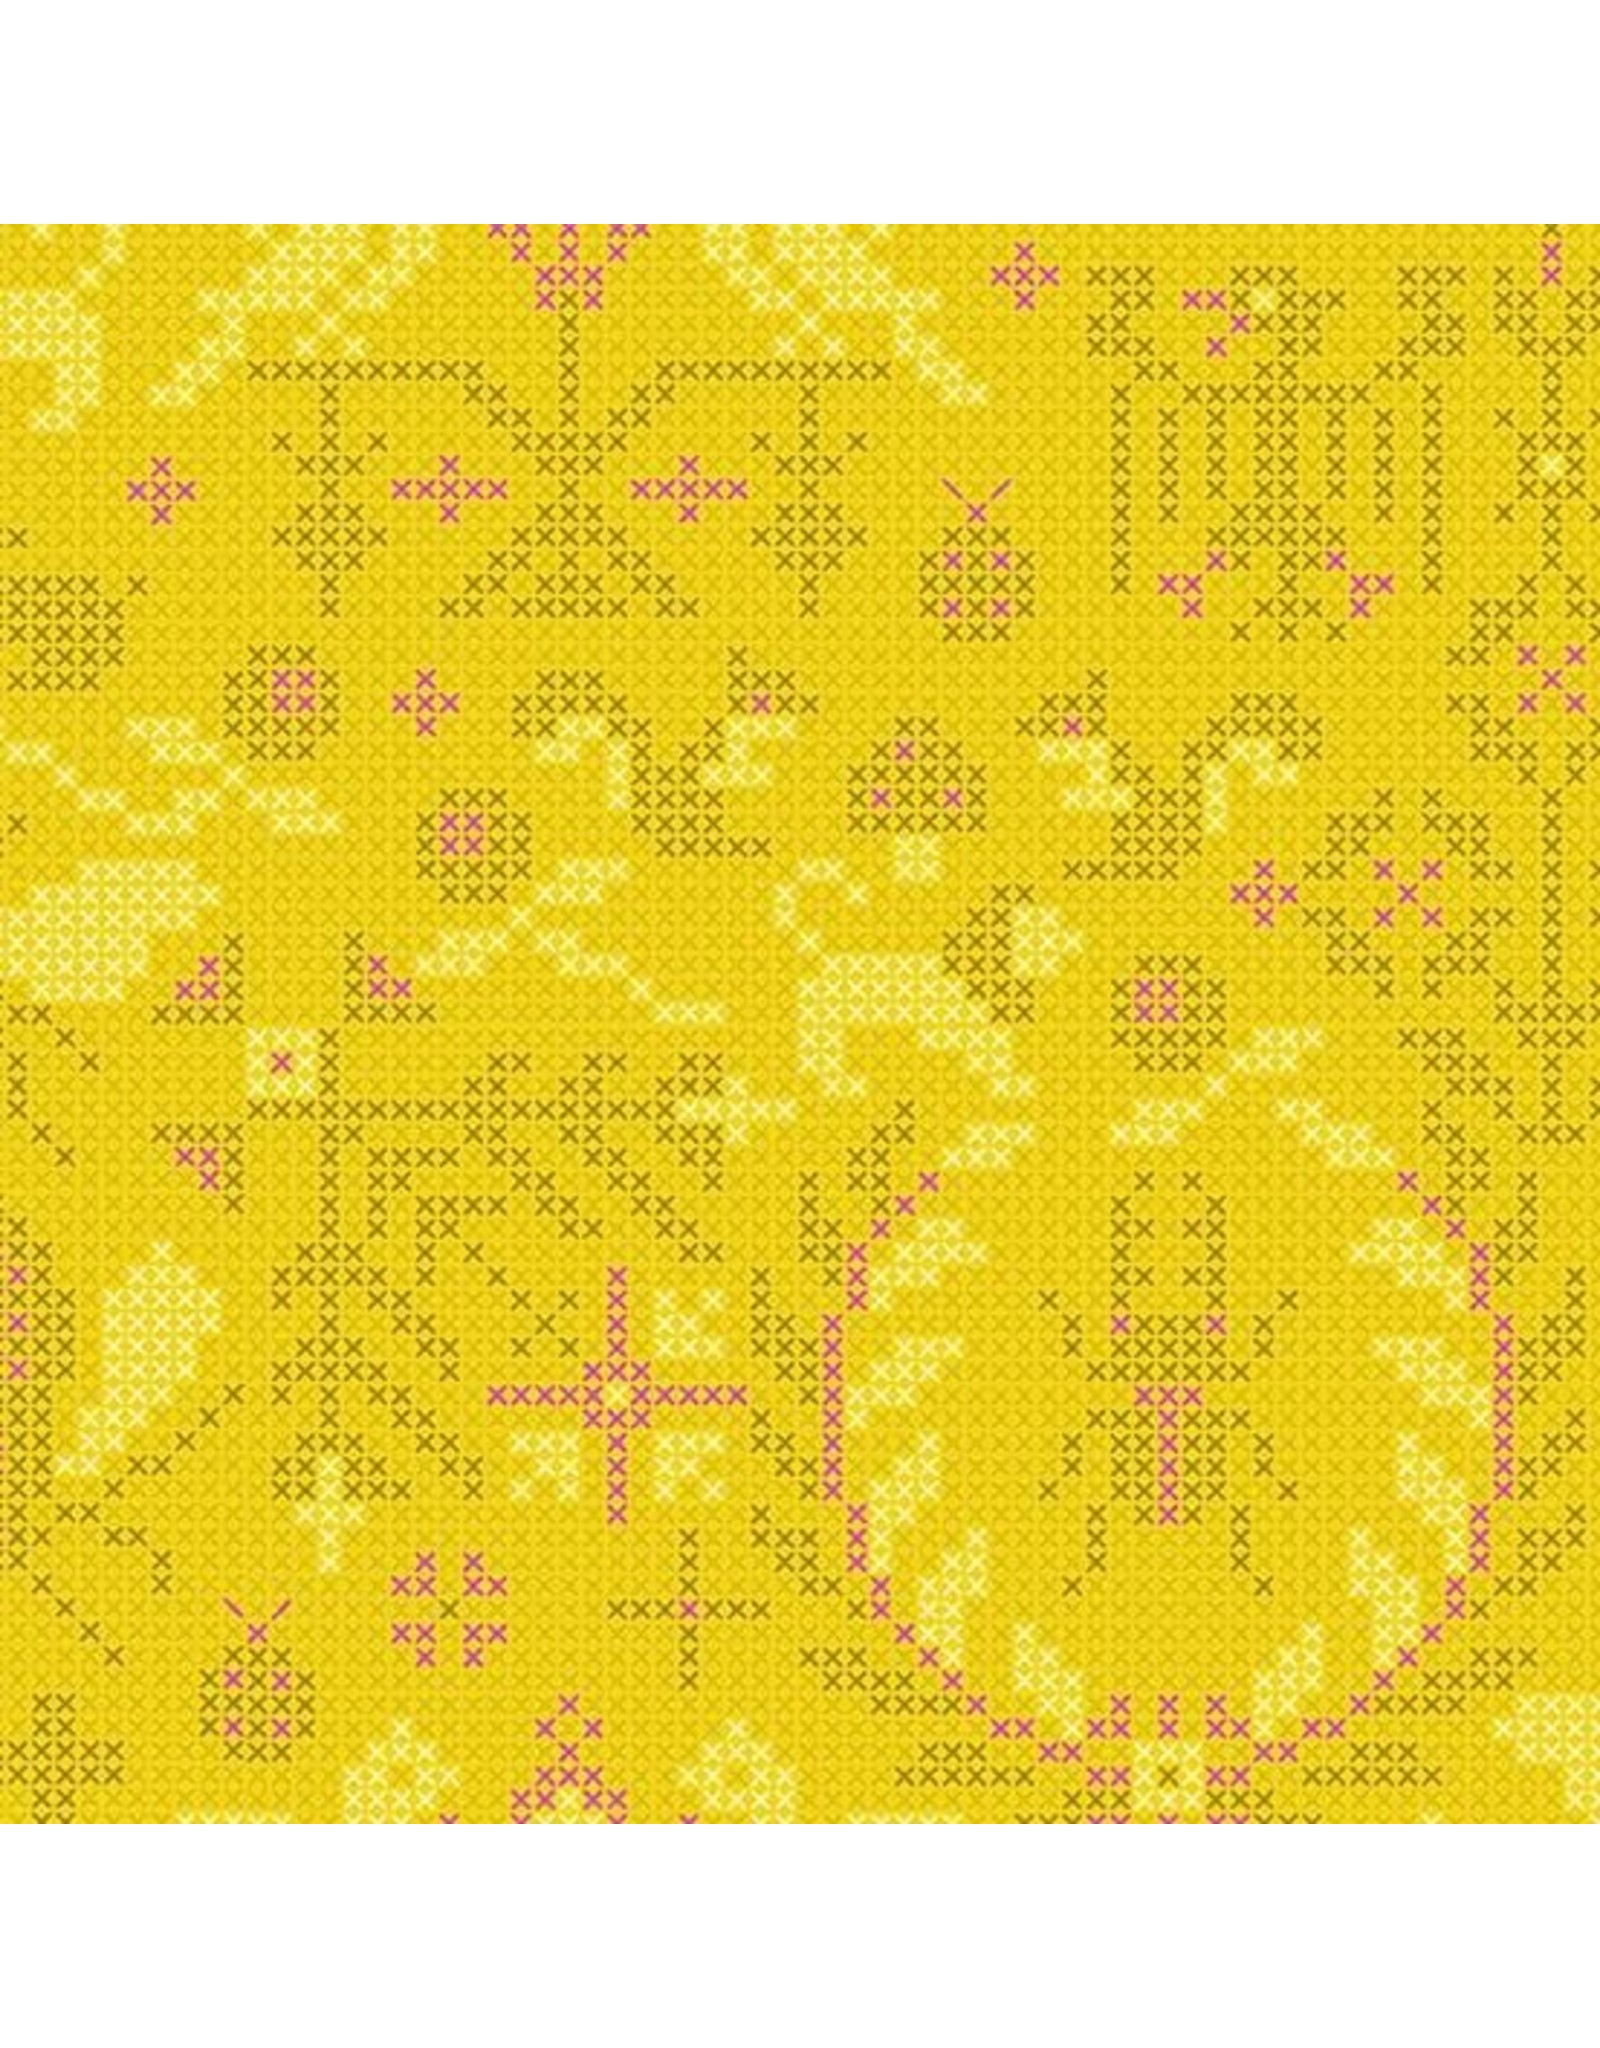 Alison Glass ON SALE-Sun Print 2020, Menagerie in Pencil, Fabric Half-Yards